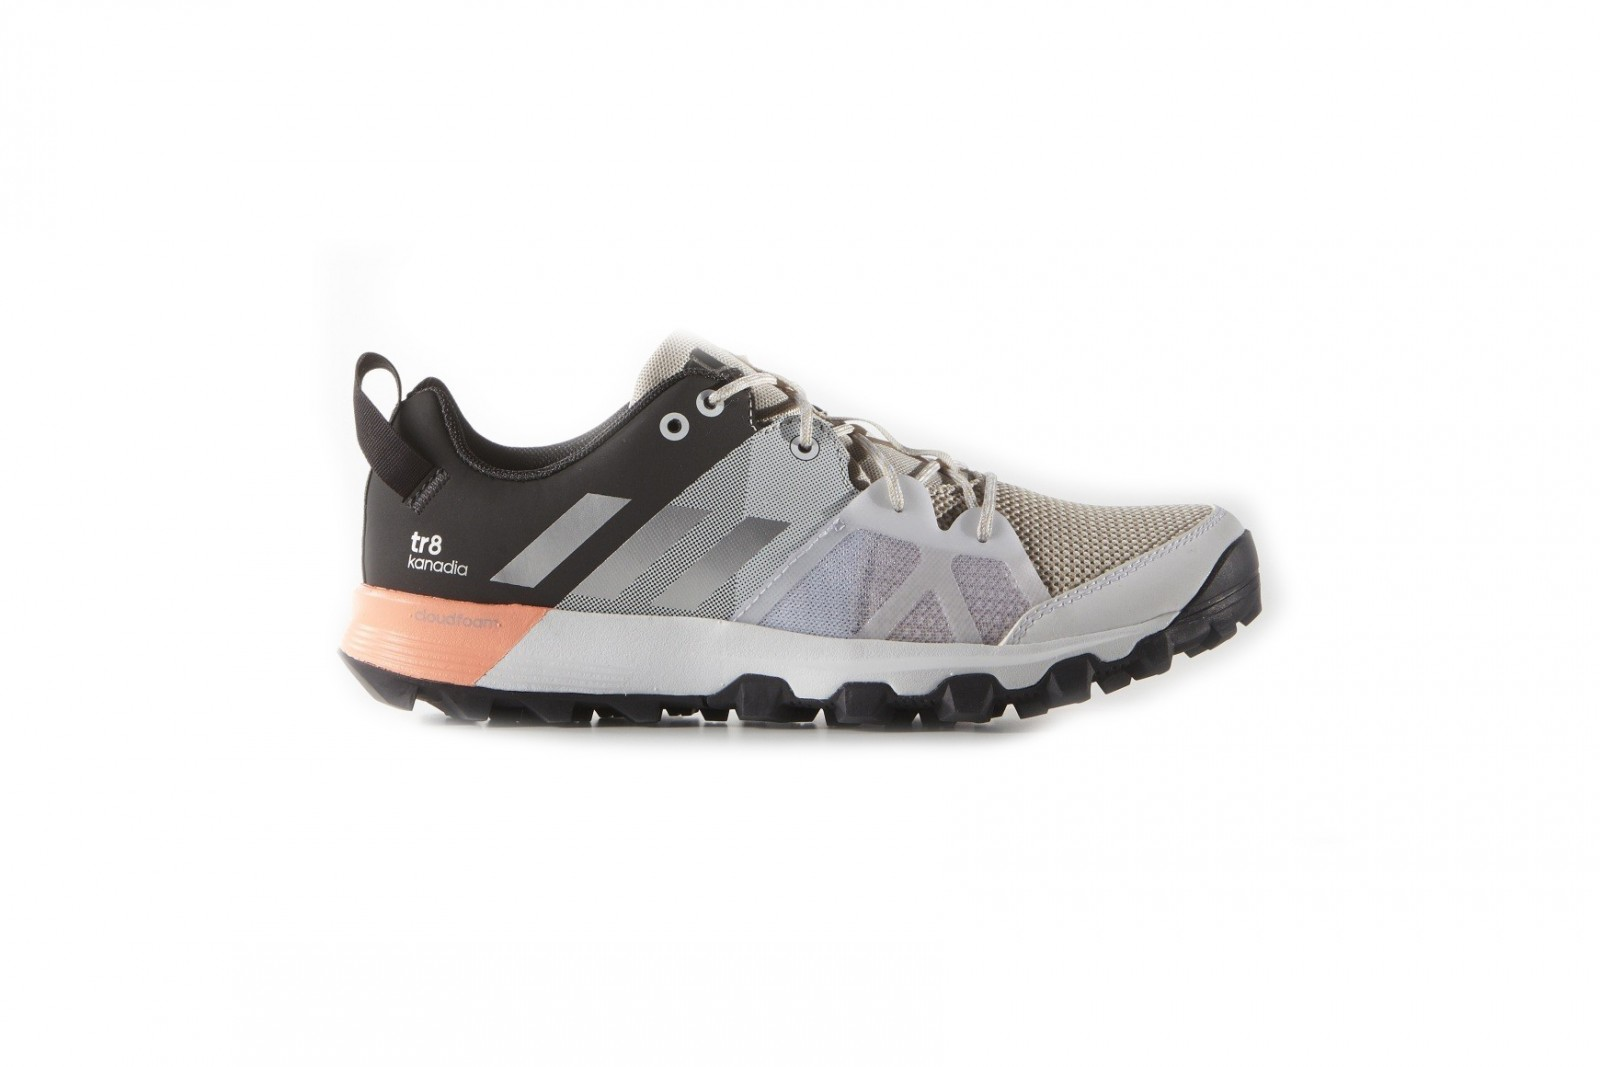 Dámské běžecké boty adidas kanadia 8 tr w  0119454c30